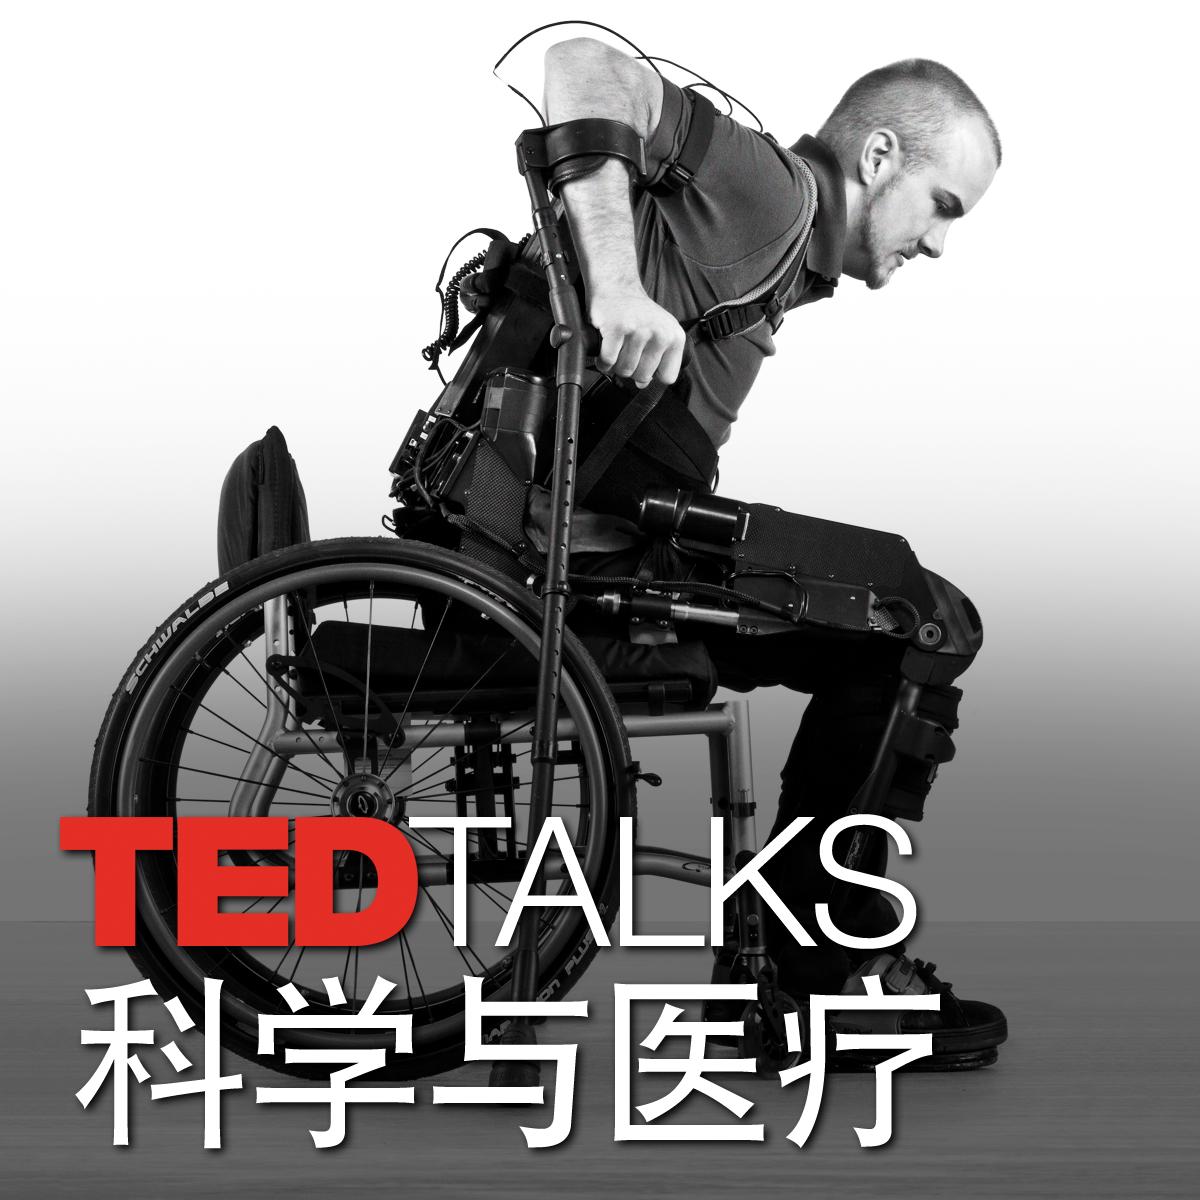 TEDTalks 科学与医疗